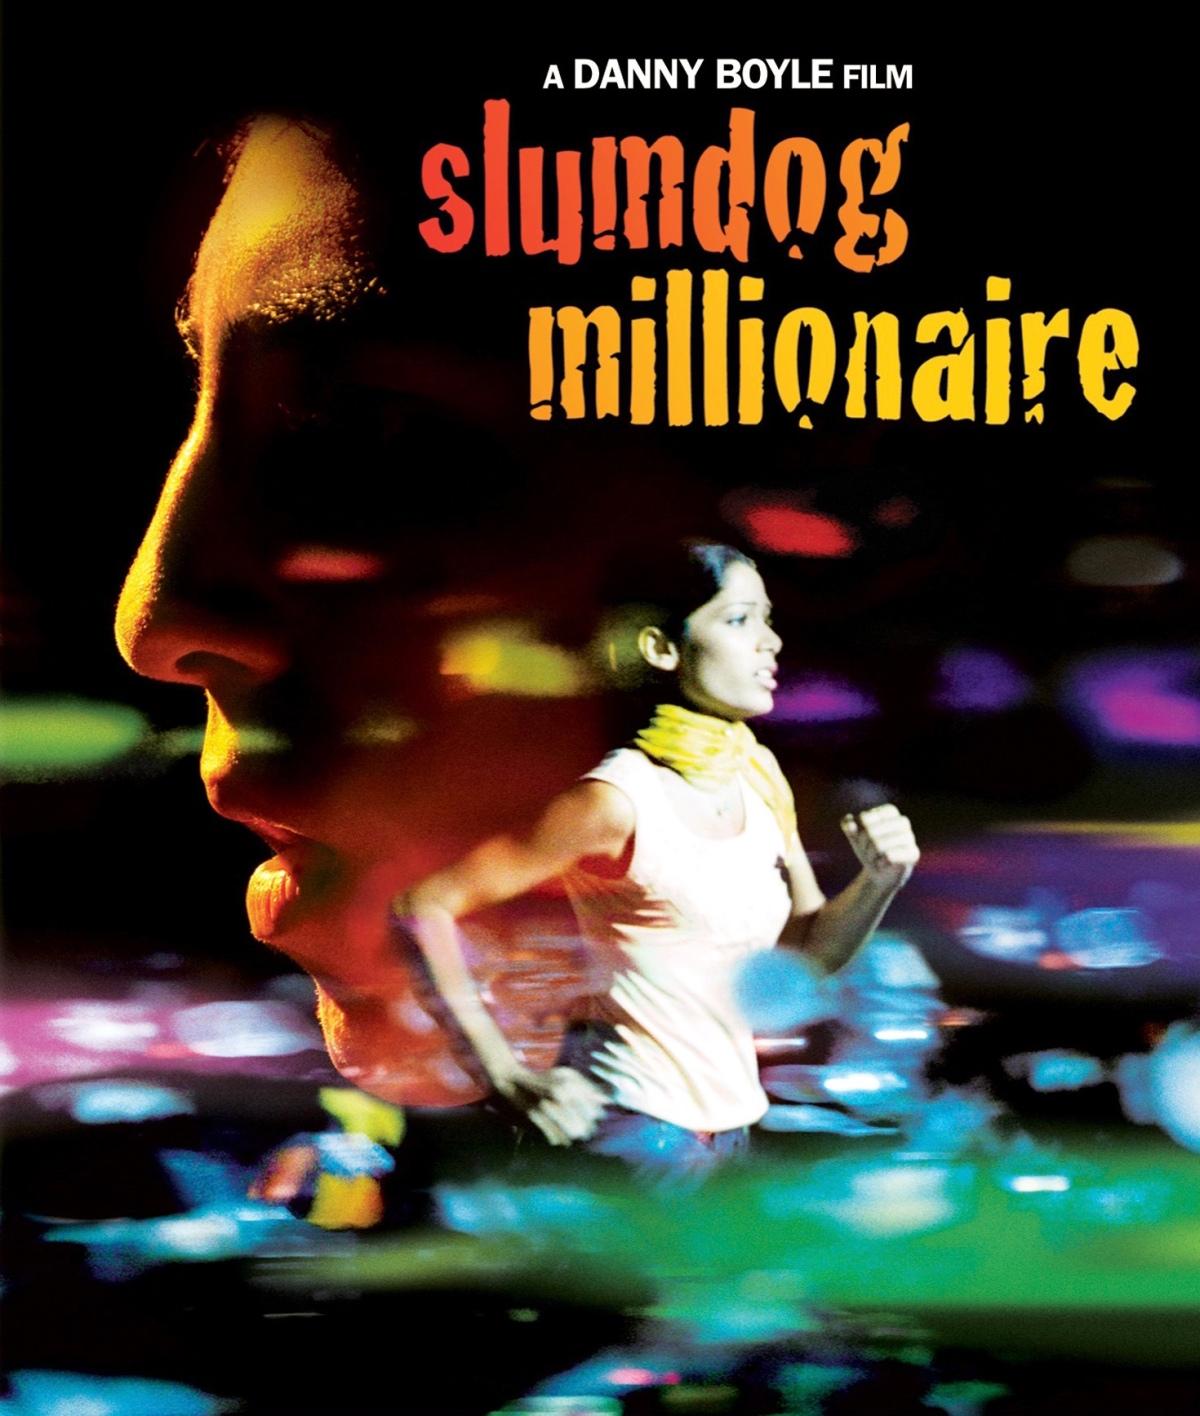 """Slumdog Millionaire"": Throwback-Tamales Review"